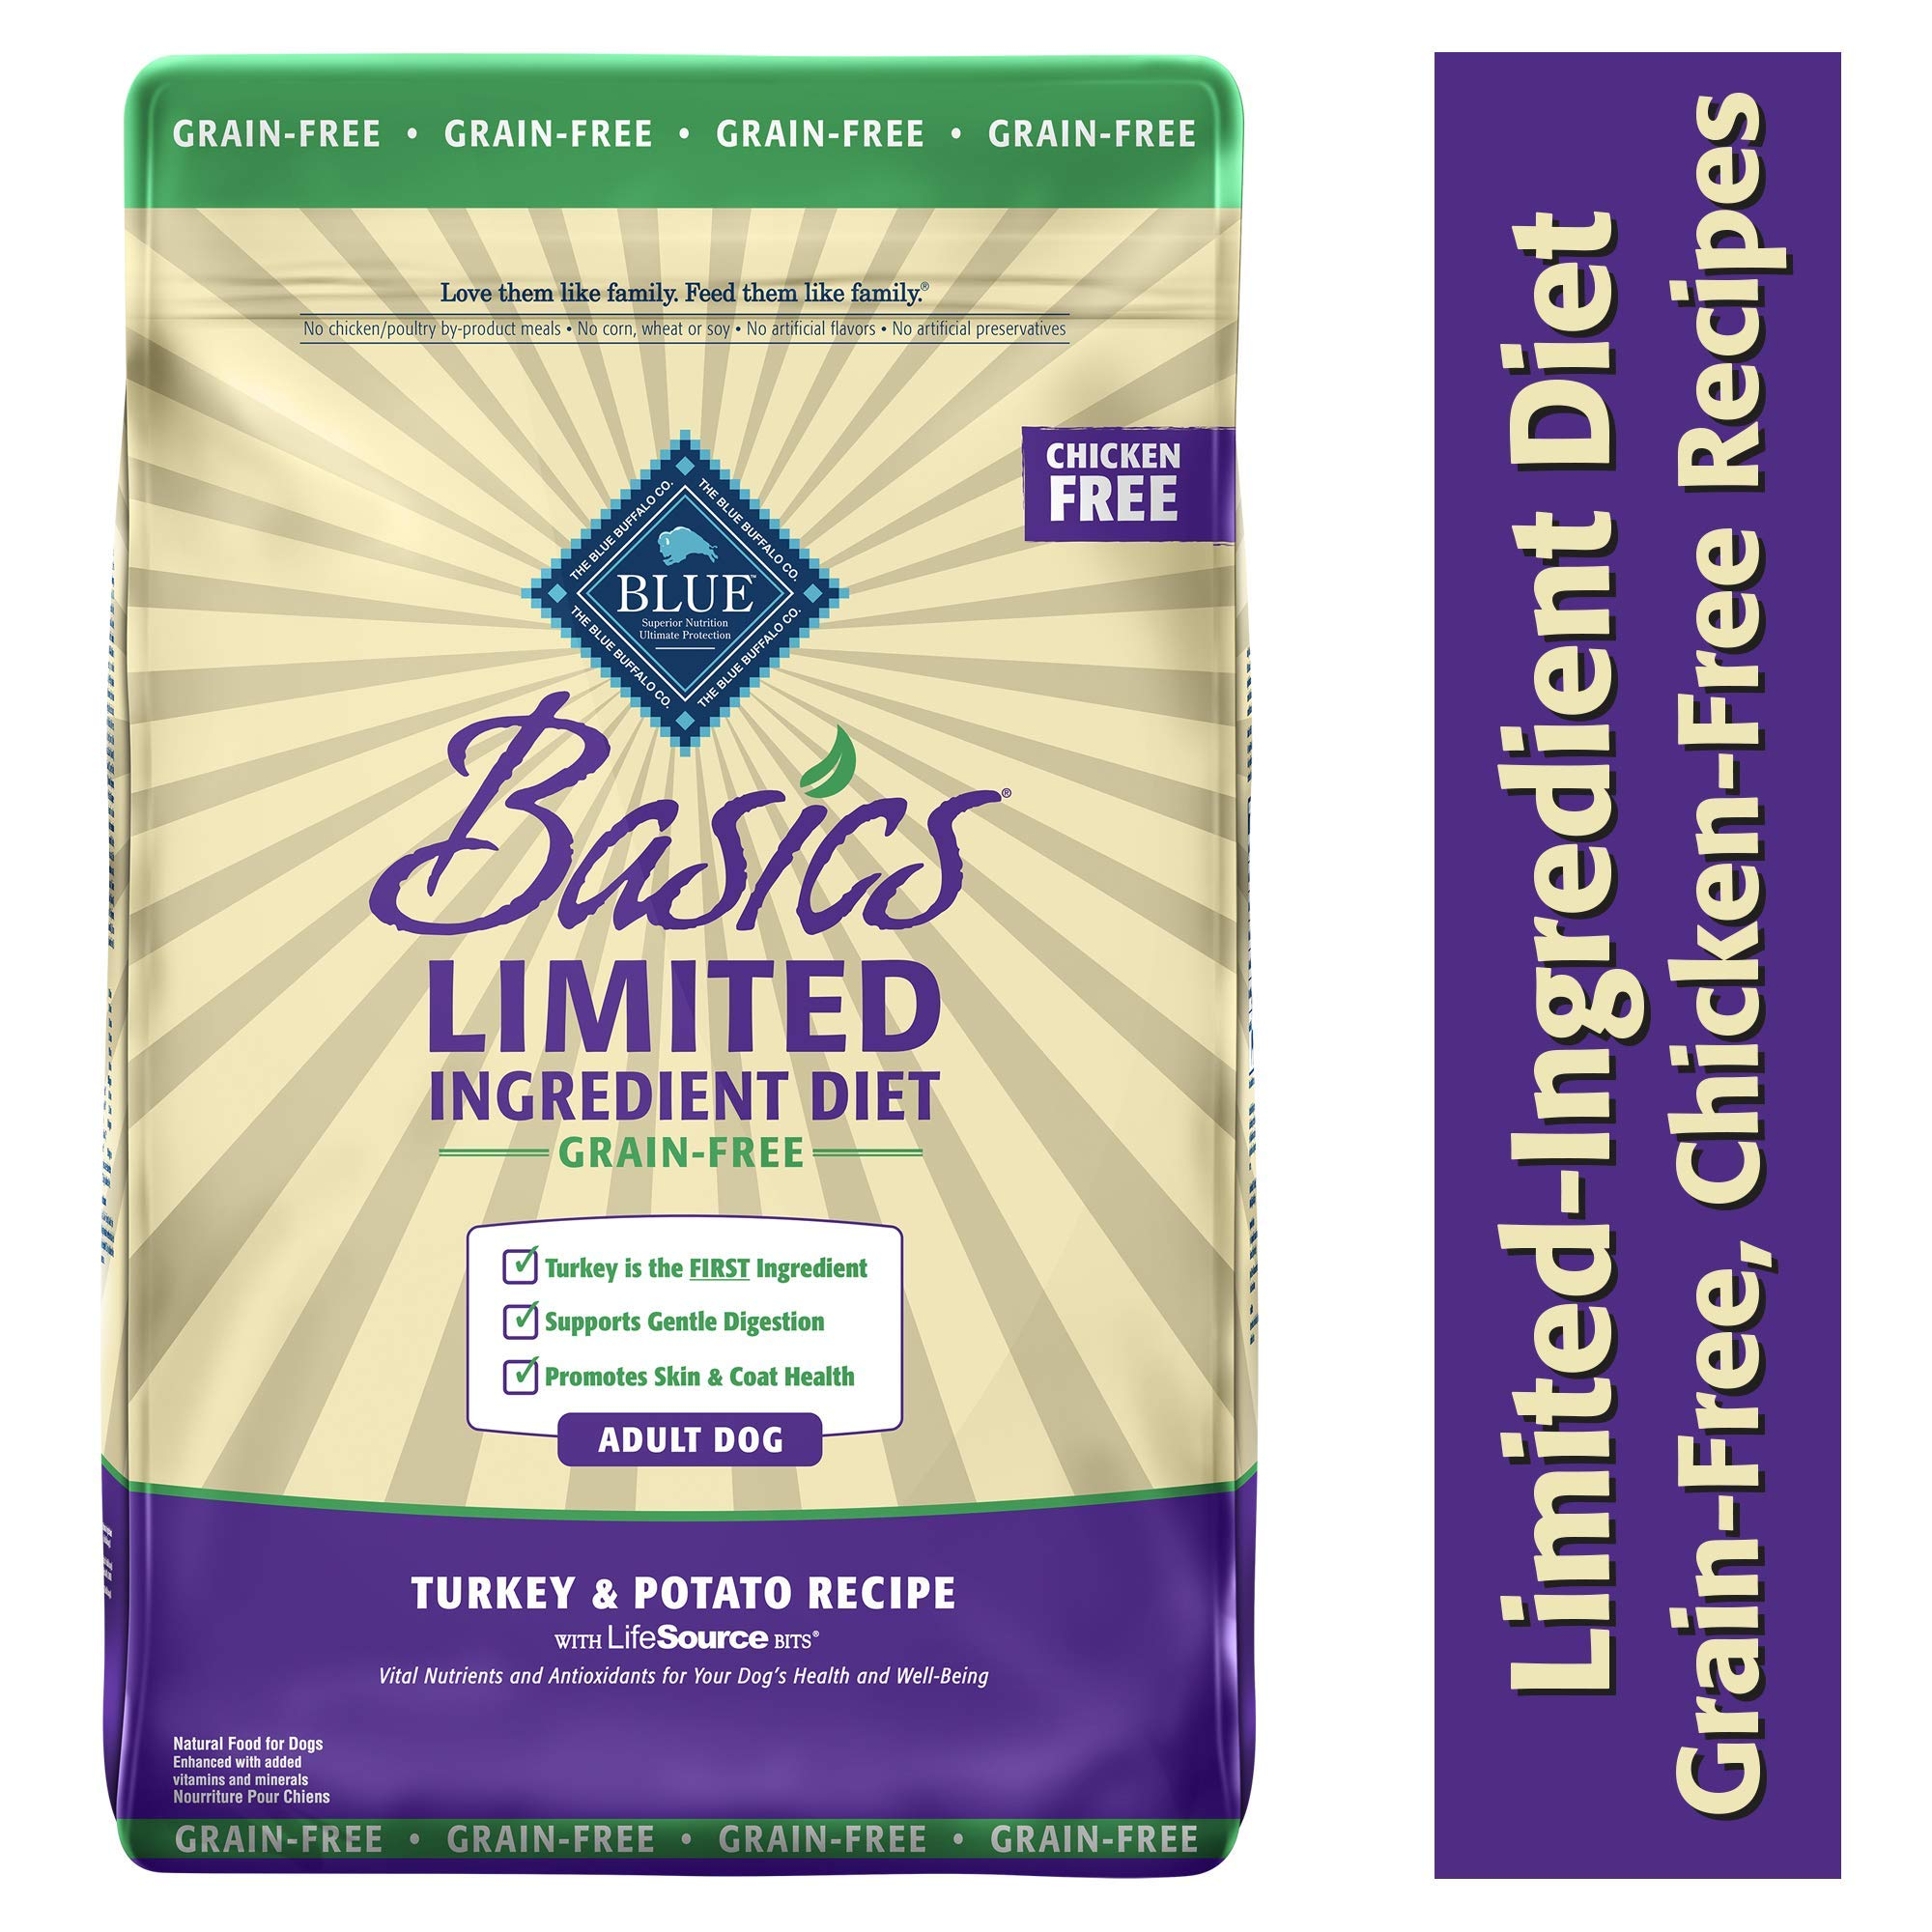 Blue Buffalo Basics Limited Ingredient Diet, Grain Free Natural Adult Dry Dog Food, Turkey & Potato 24-lb by Blue Buffalo